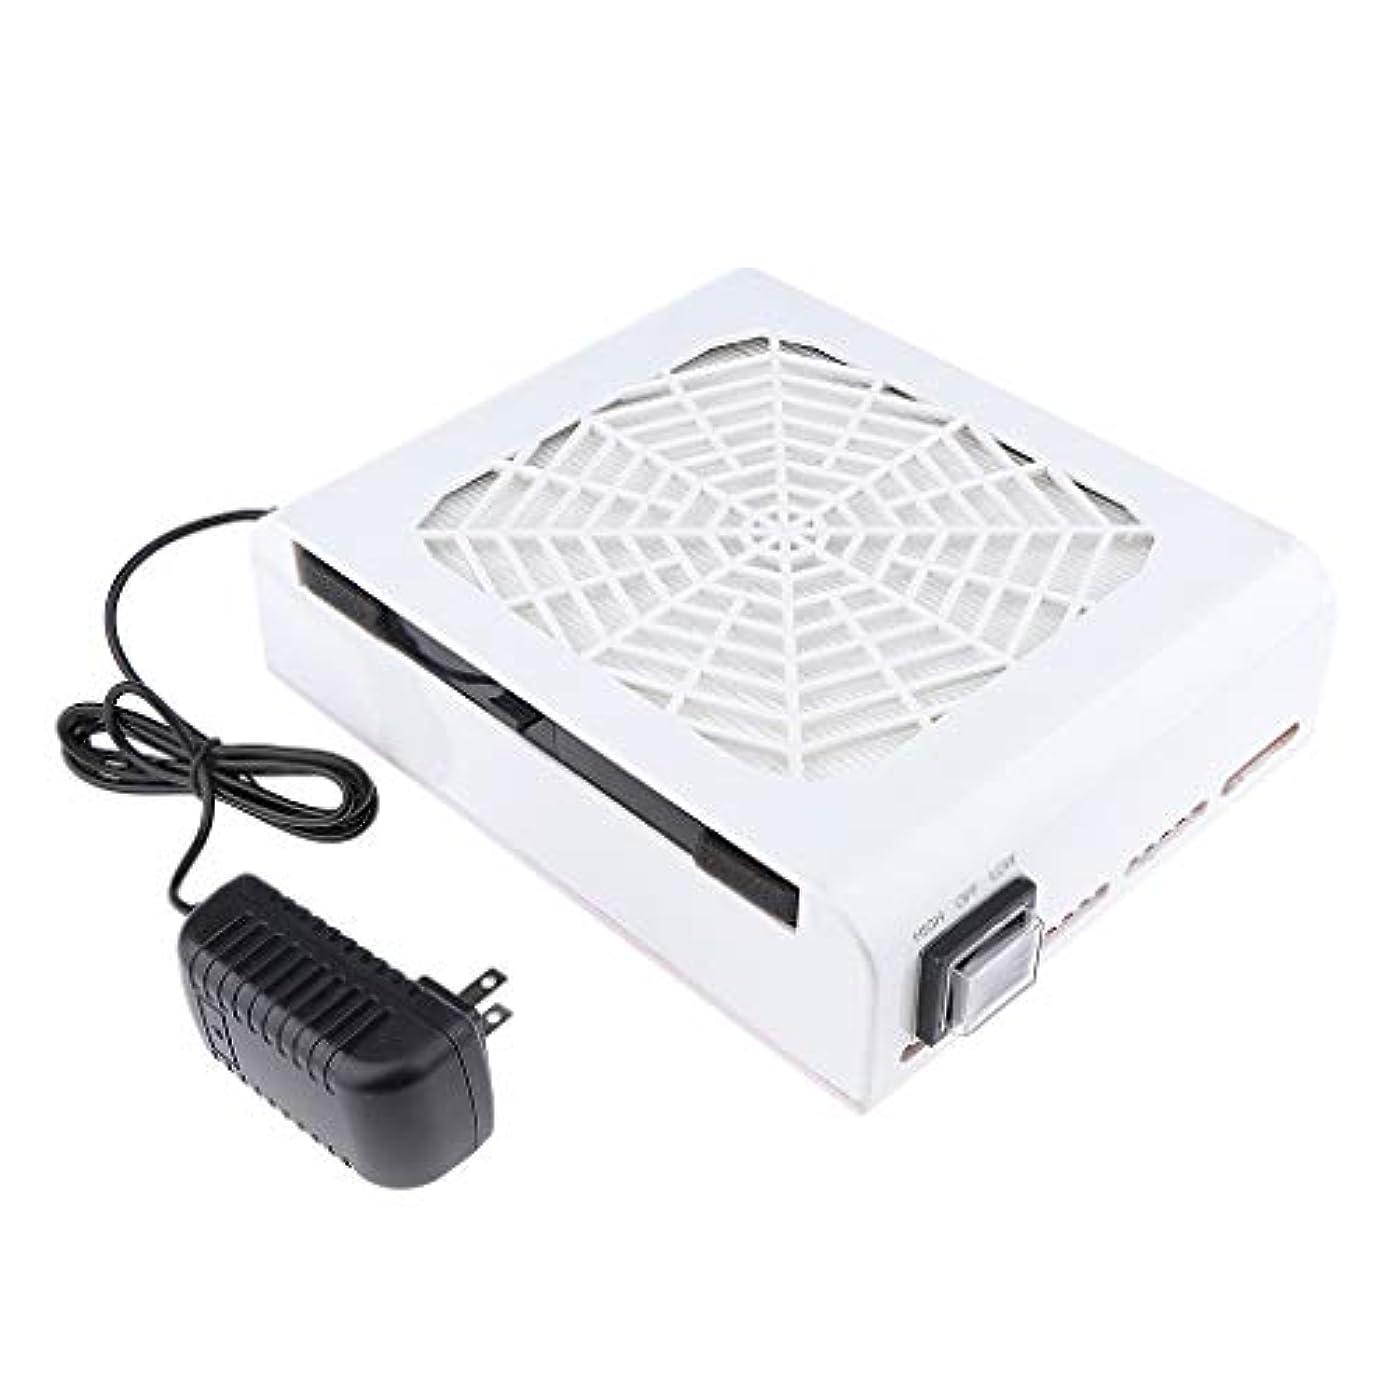 B Baosity 48W ネイルダストコレクター ネイルアート ネイルダスト 電動 塵収集